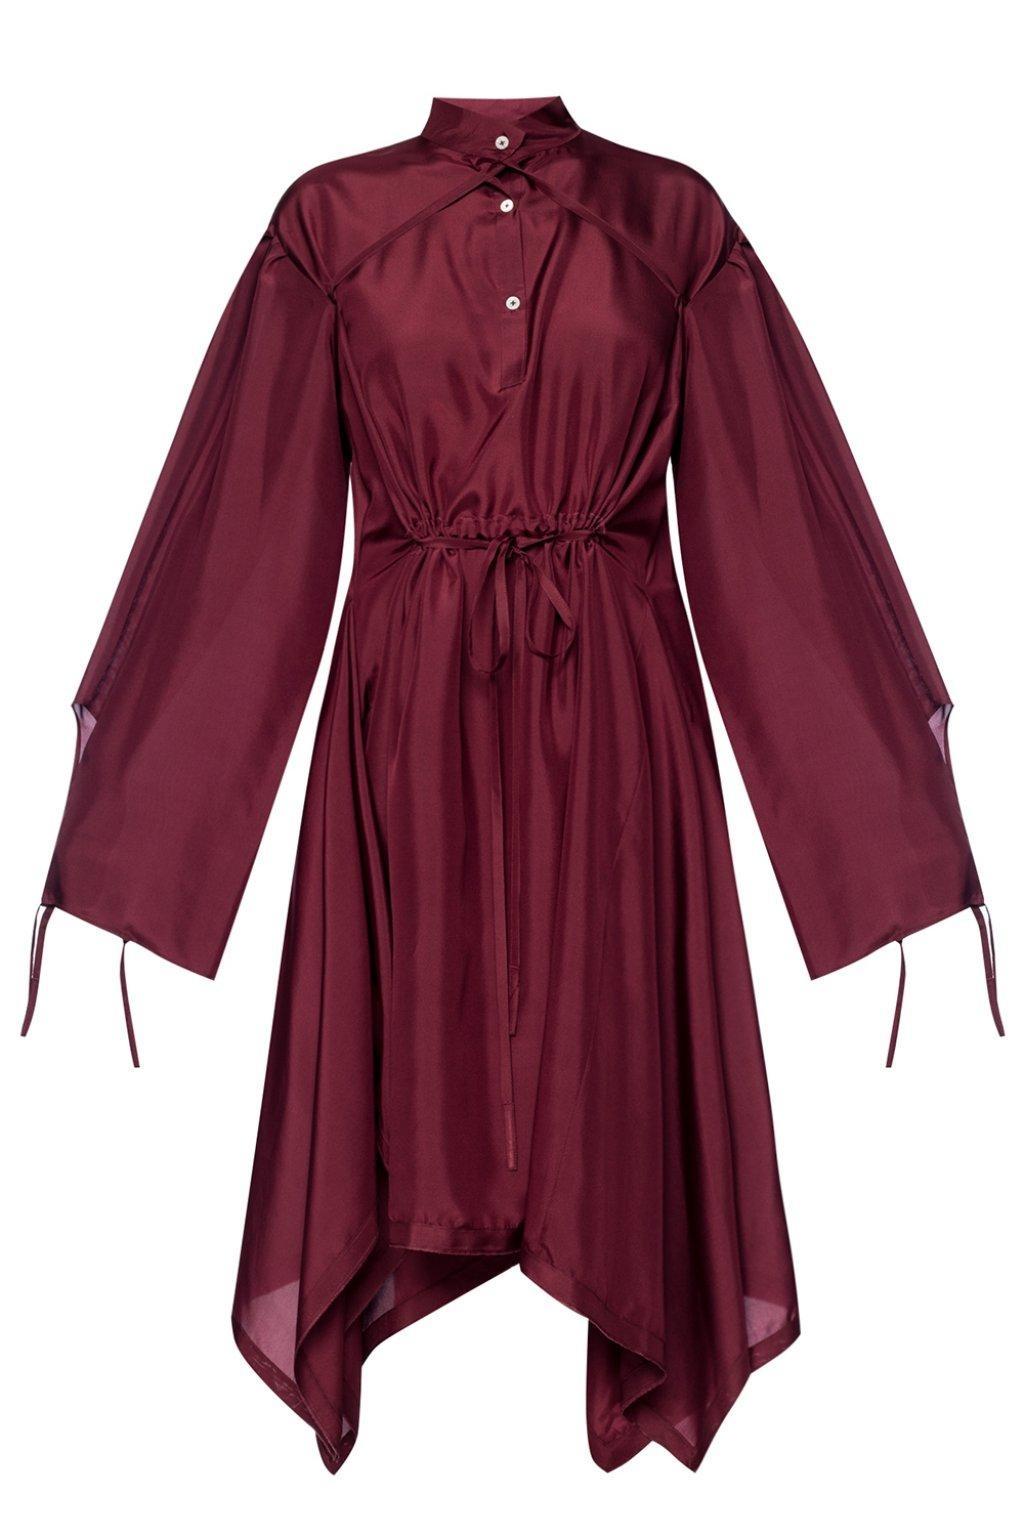 Silk Dress  - Burgundy - Sz 38-1